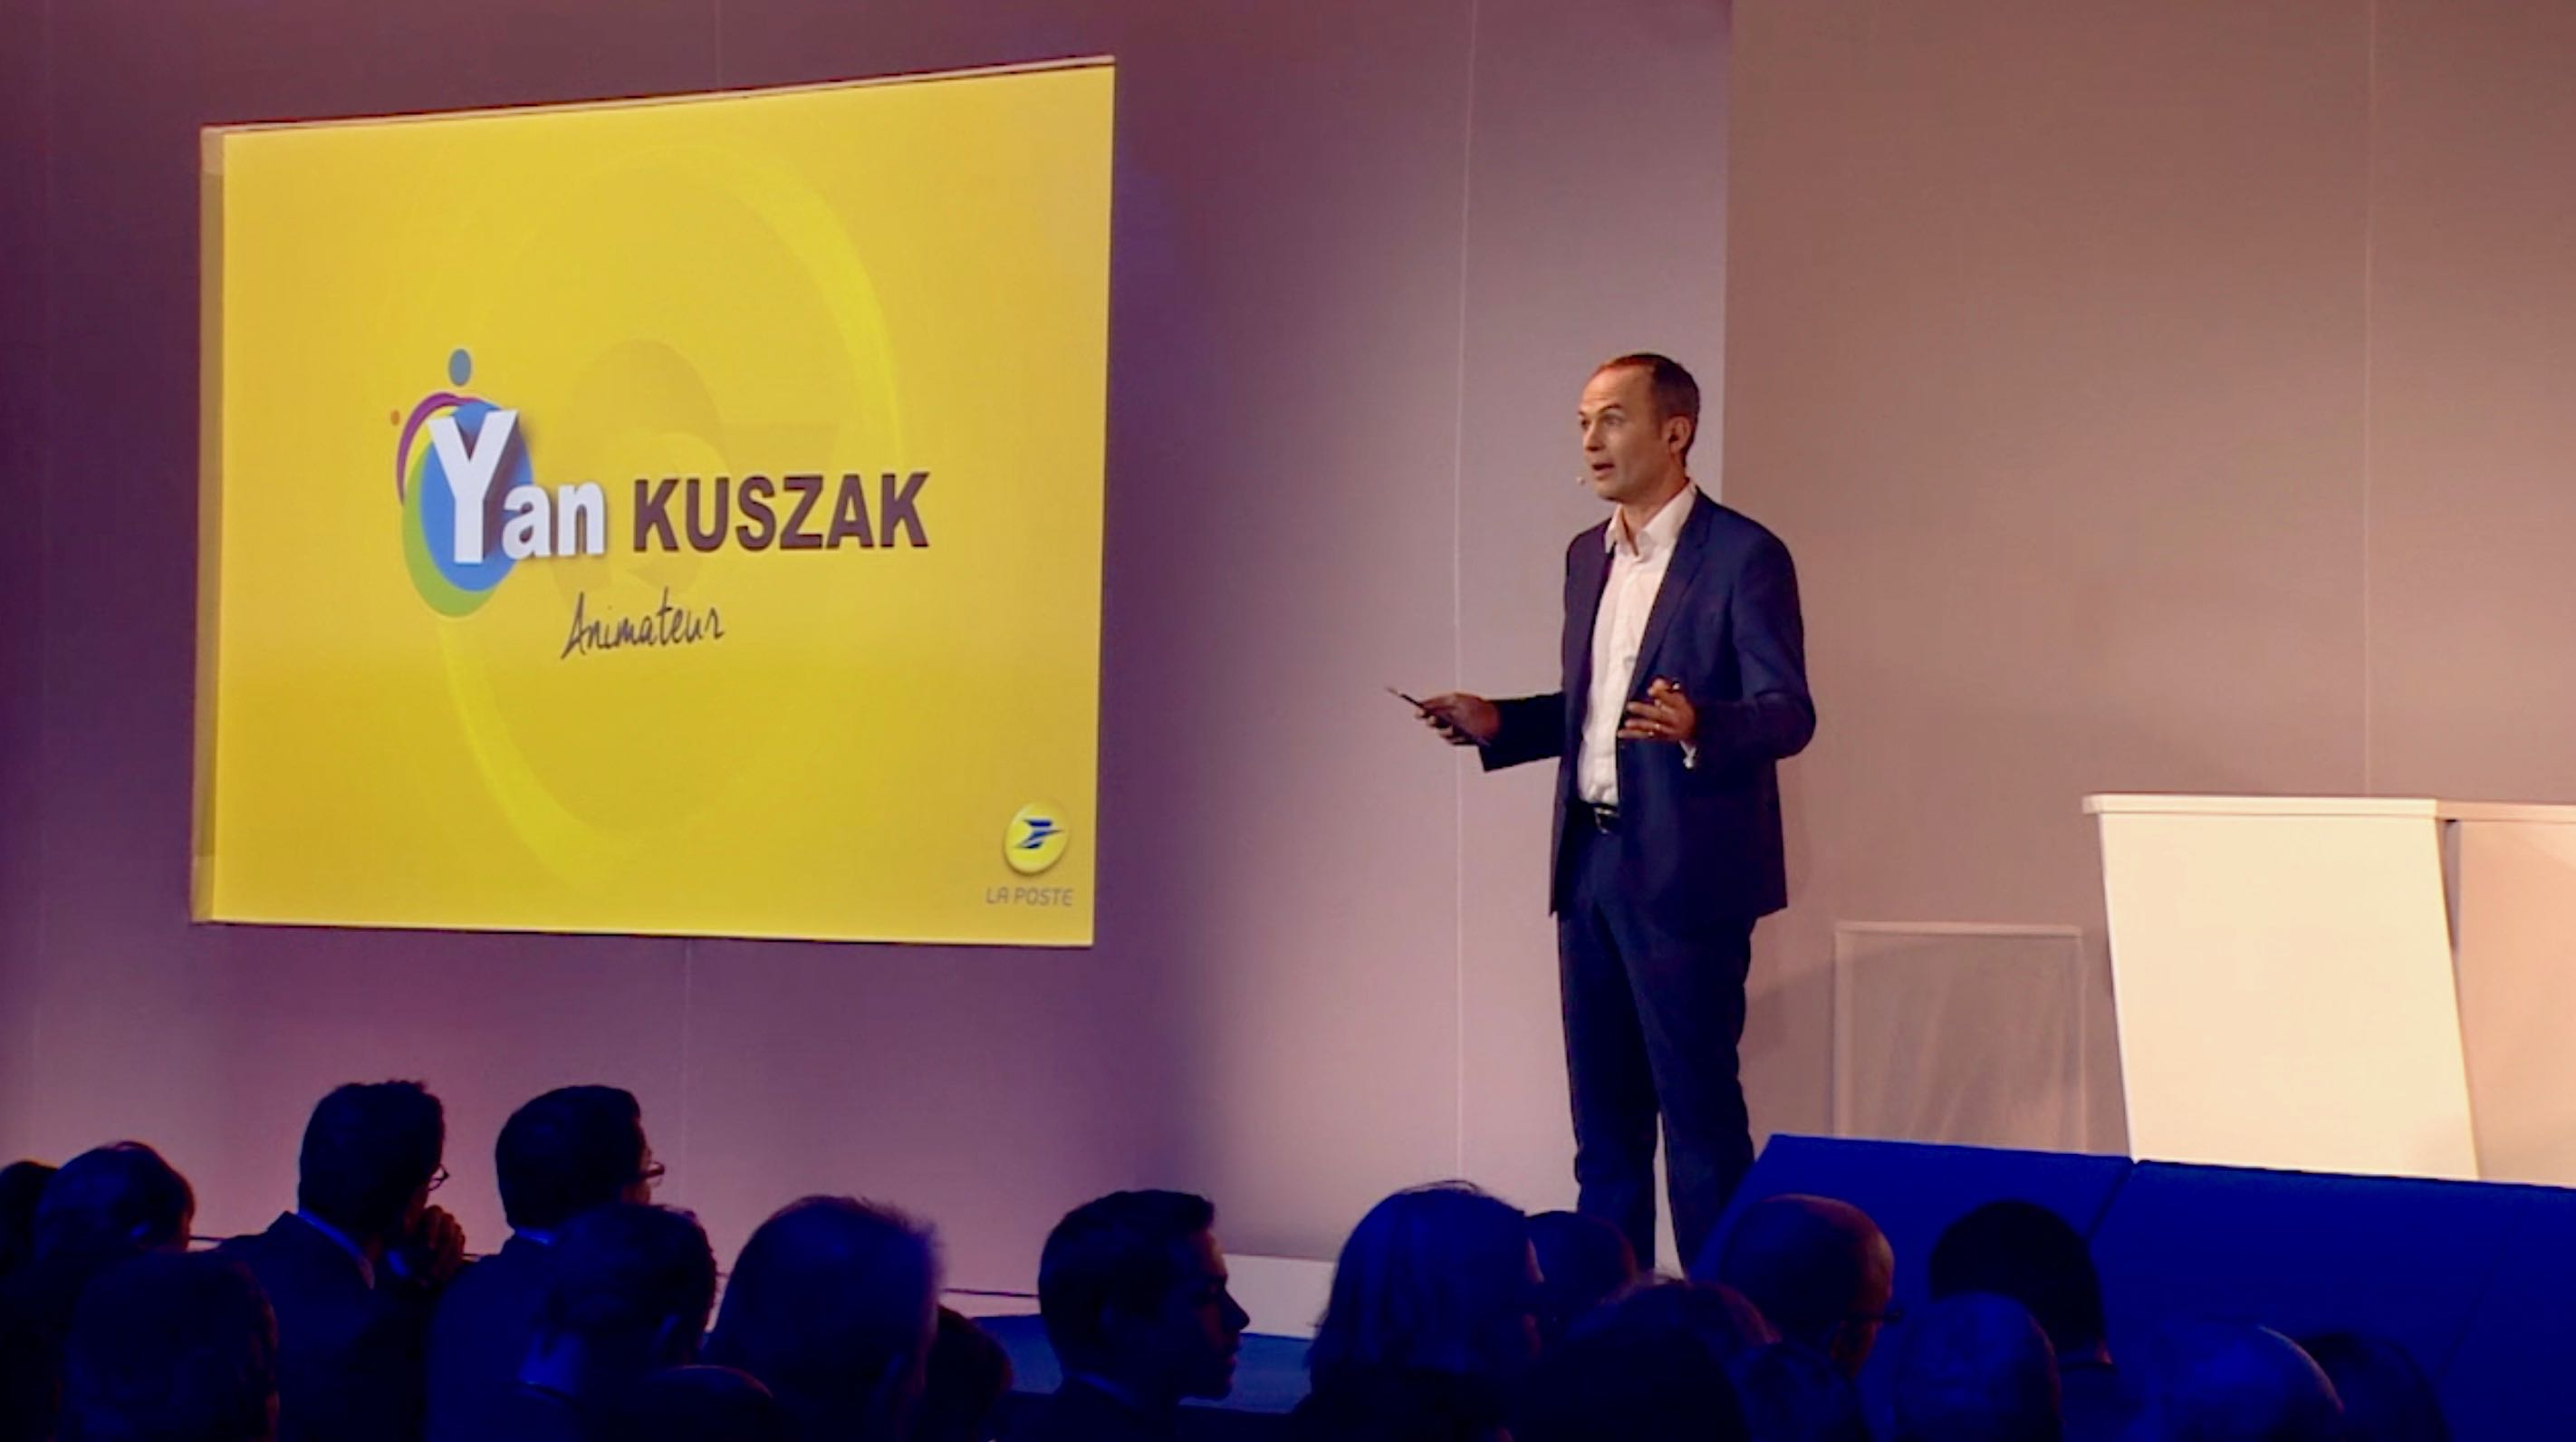 Yan Kuszak #eventhost #MC #maitredeceremonie #mykrosport #presenter #presentateur